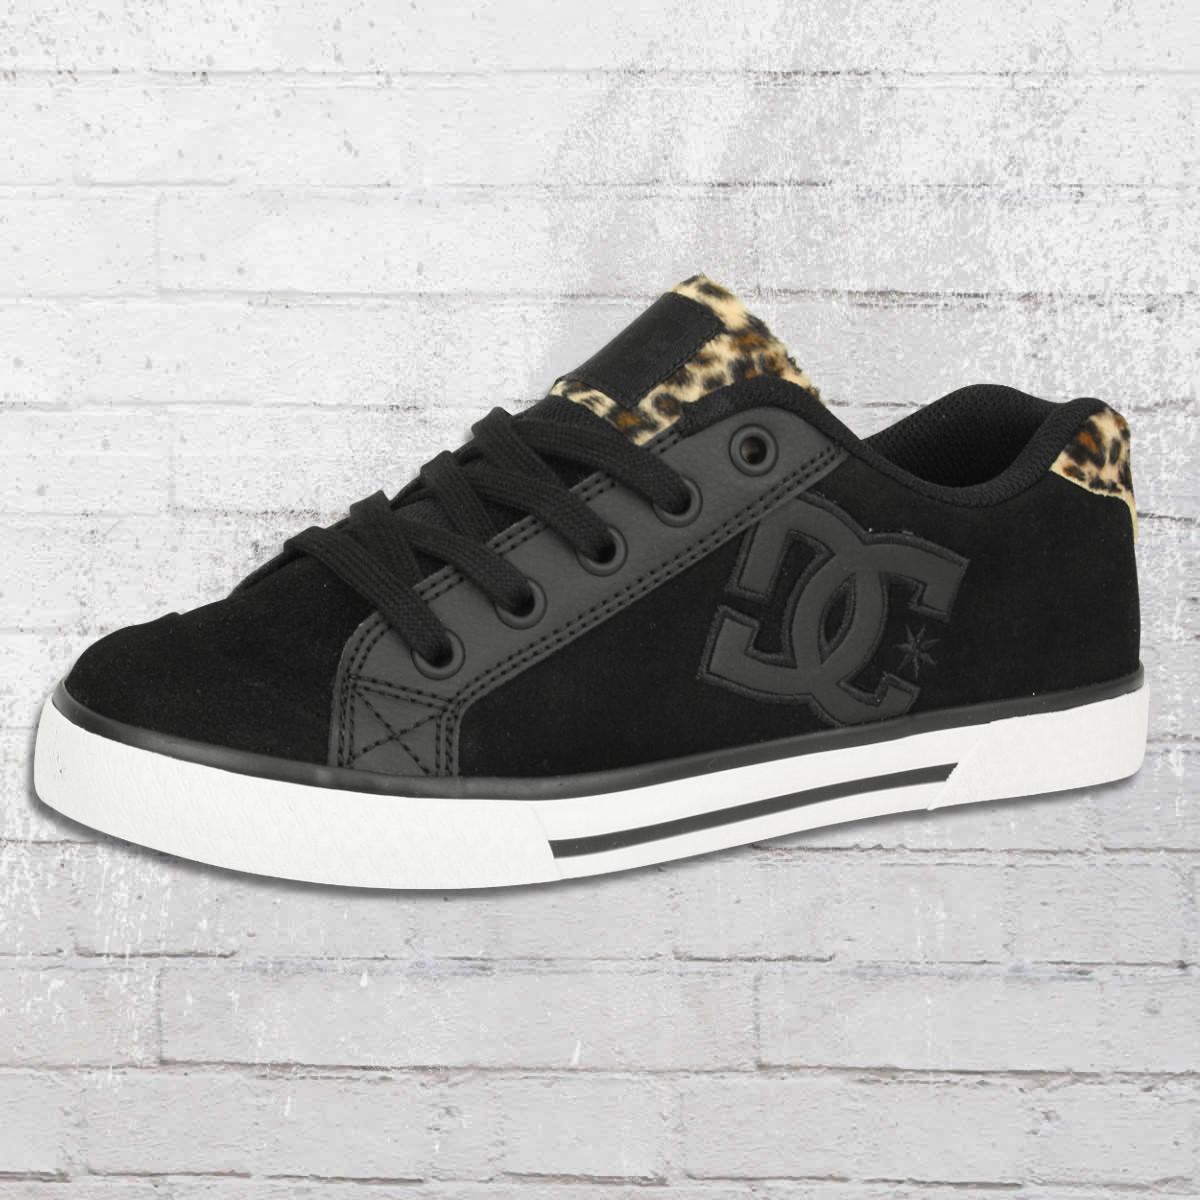 Sneaker Ladies Chelsea Black Order Shoes Se Now Leopard Dc 6qwIp